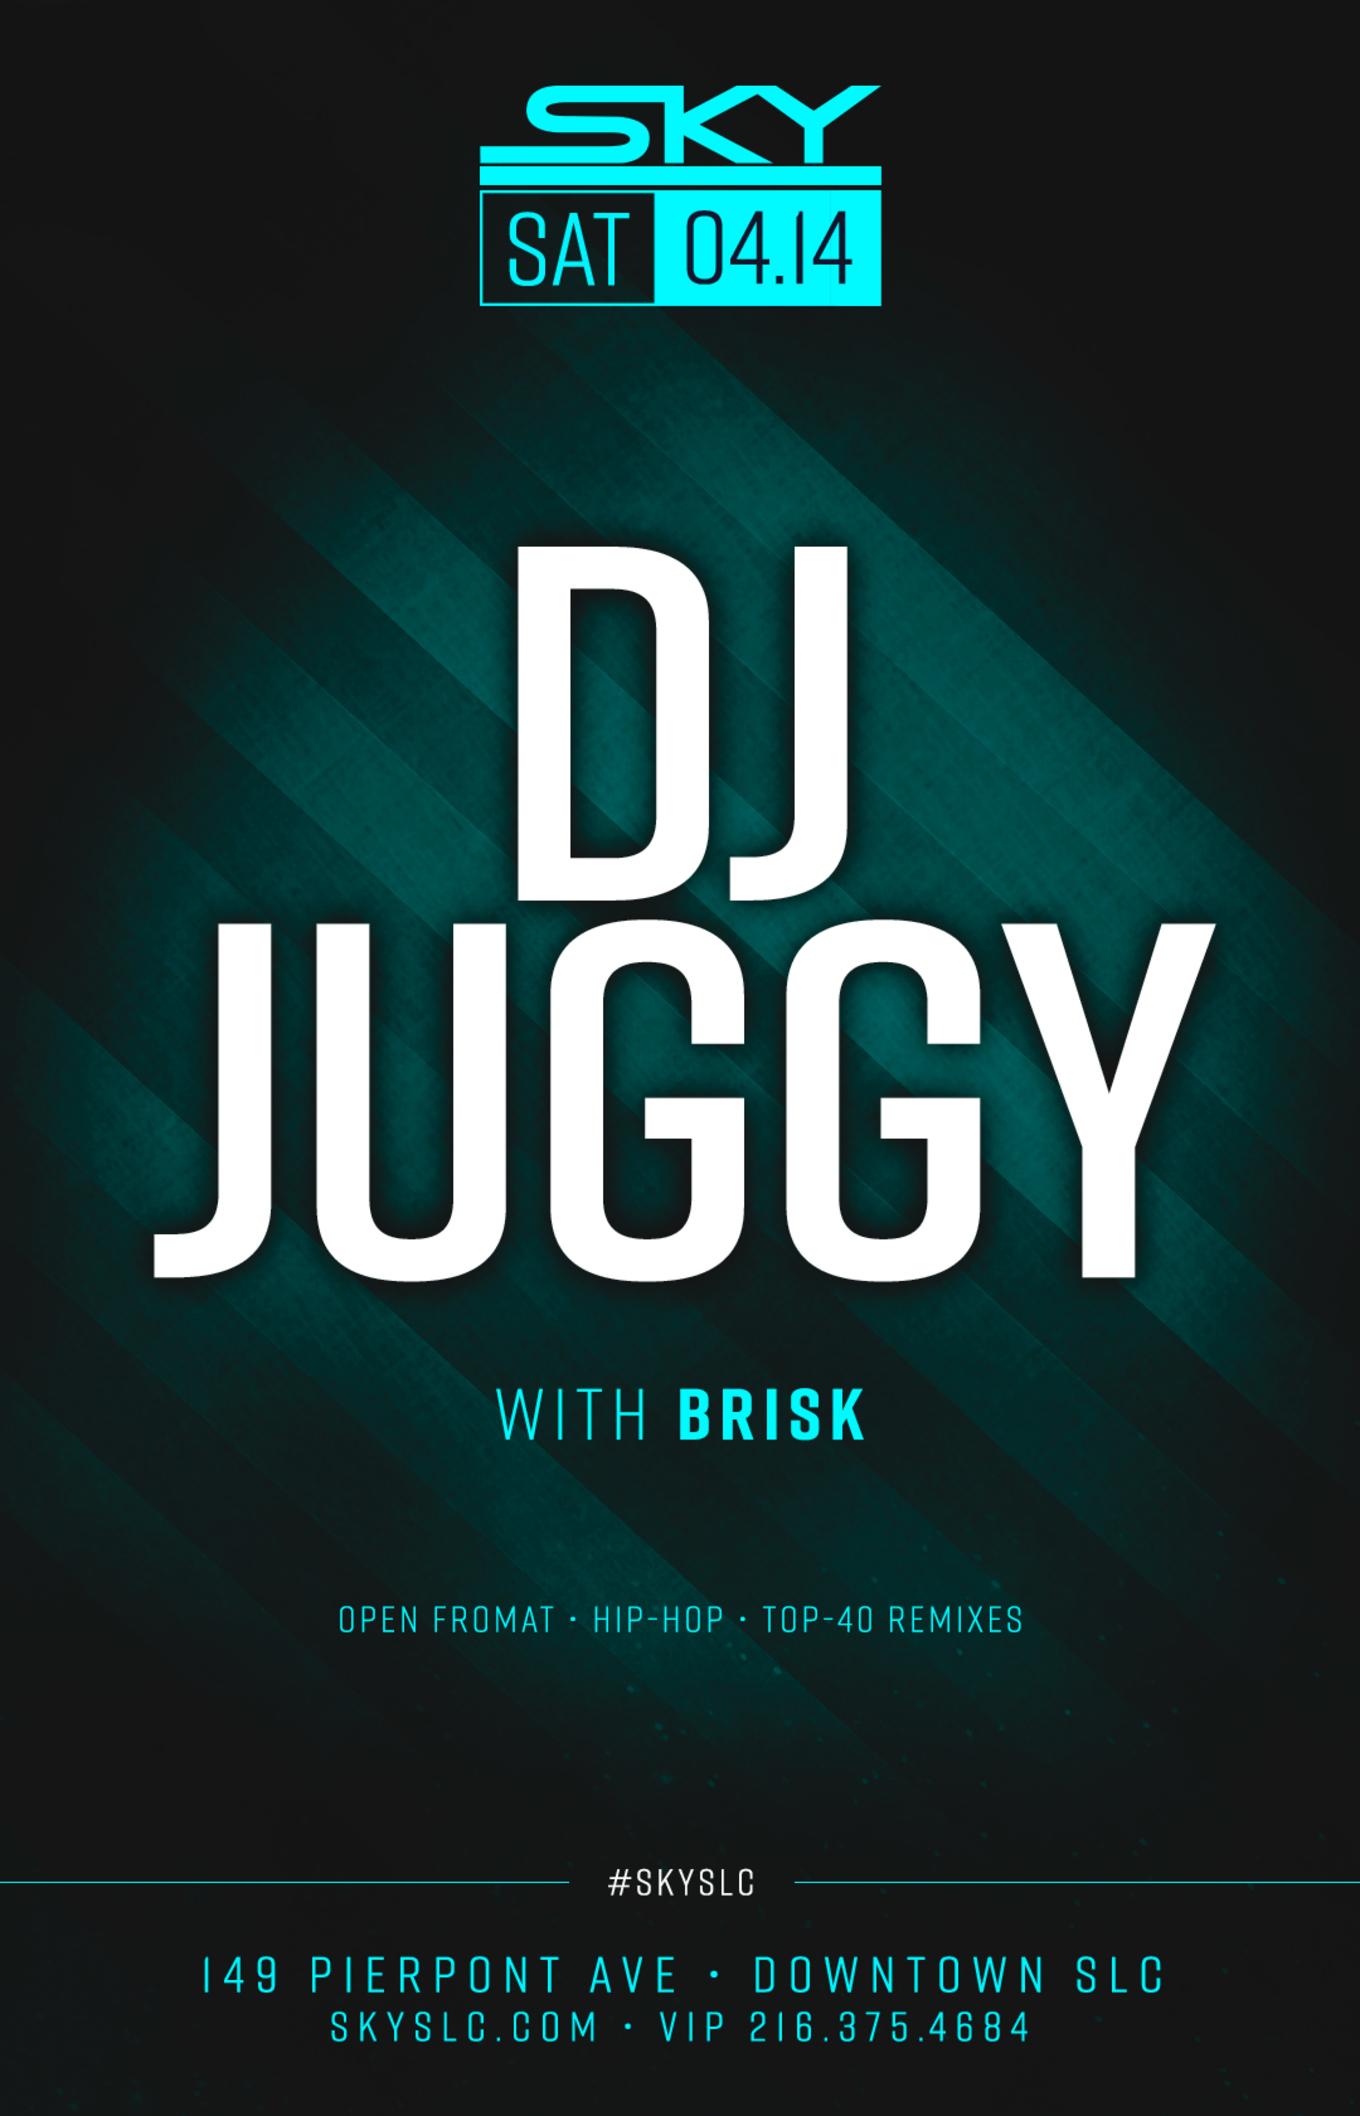 SKY SATURDAYS : DJ JUGGY - Tickets - Sky SLC, Salt Lake City, UT